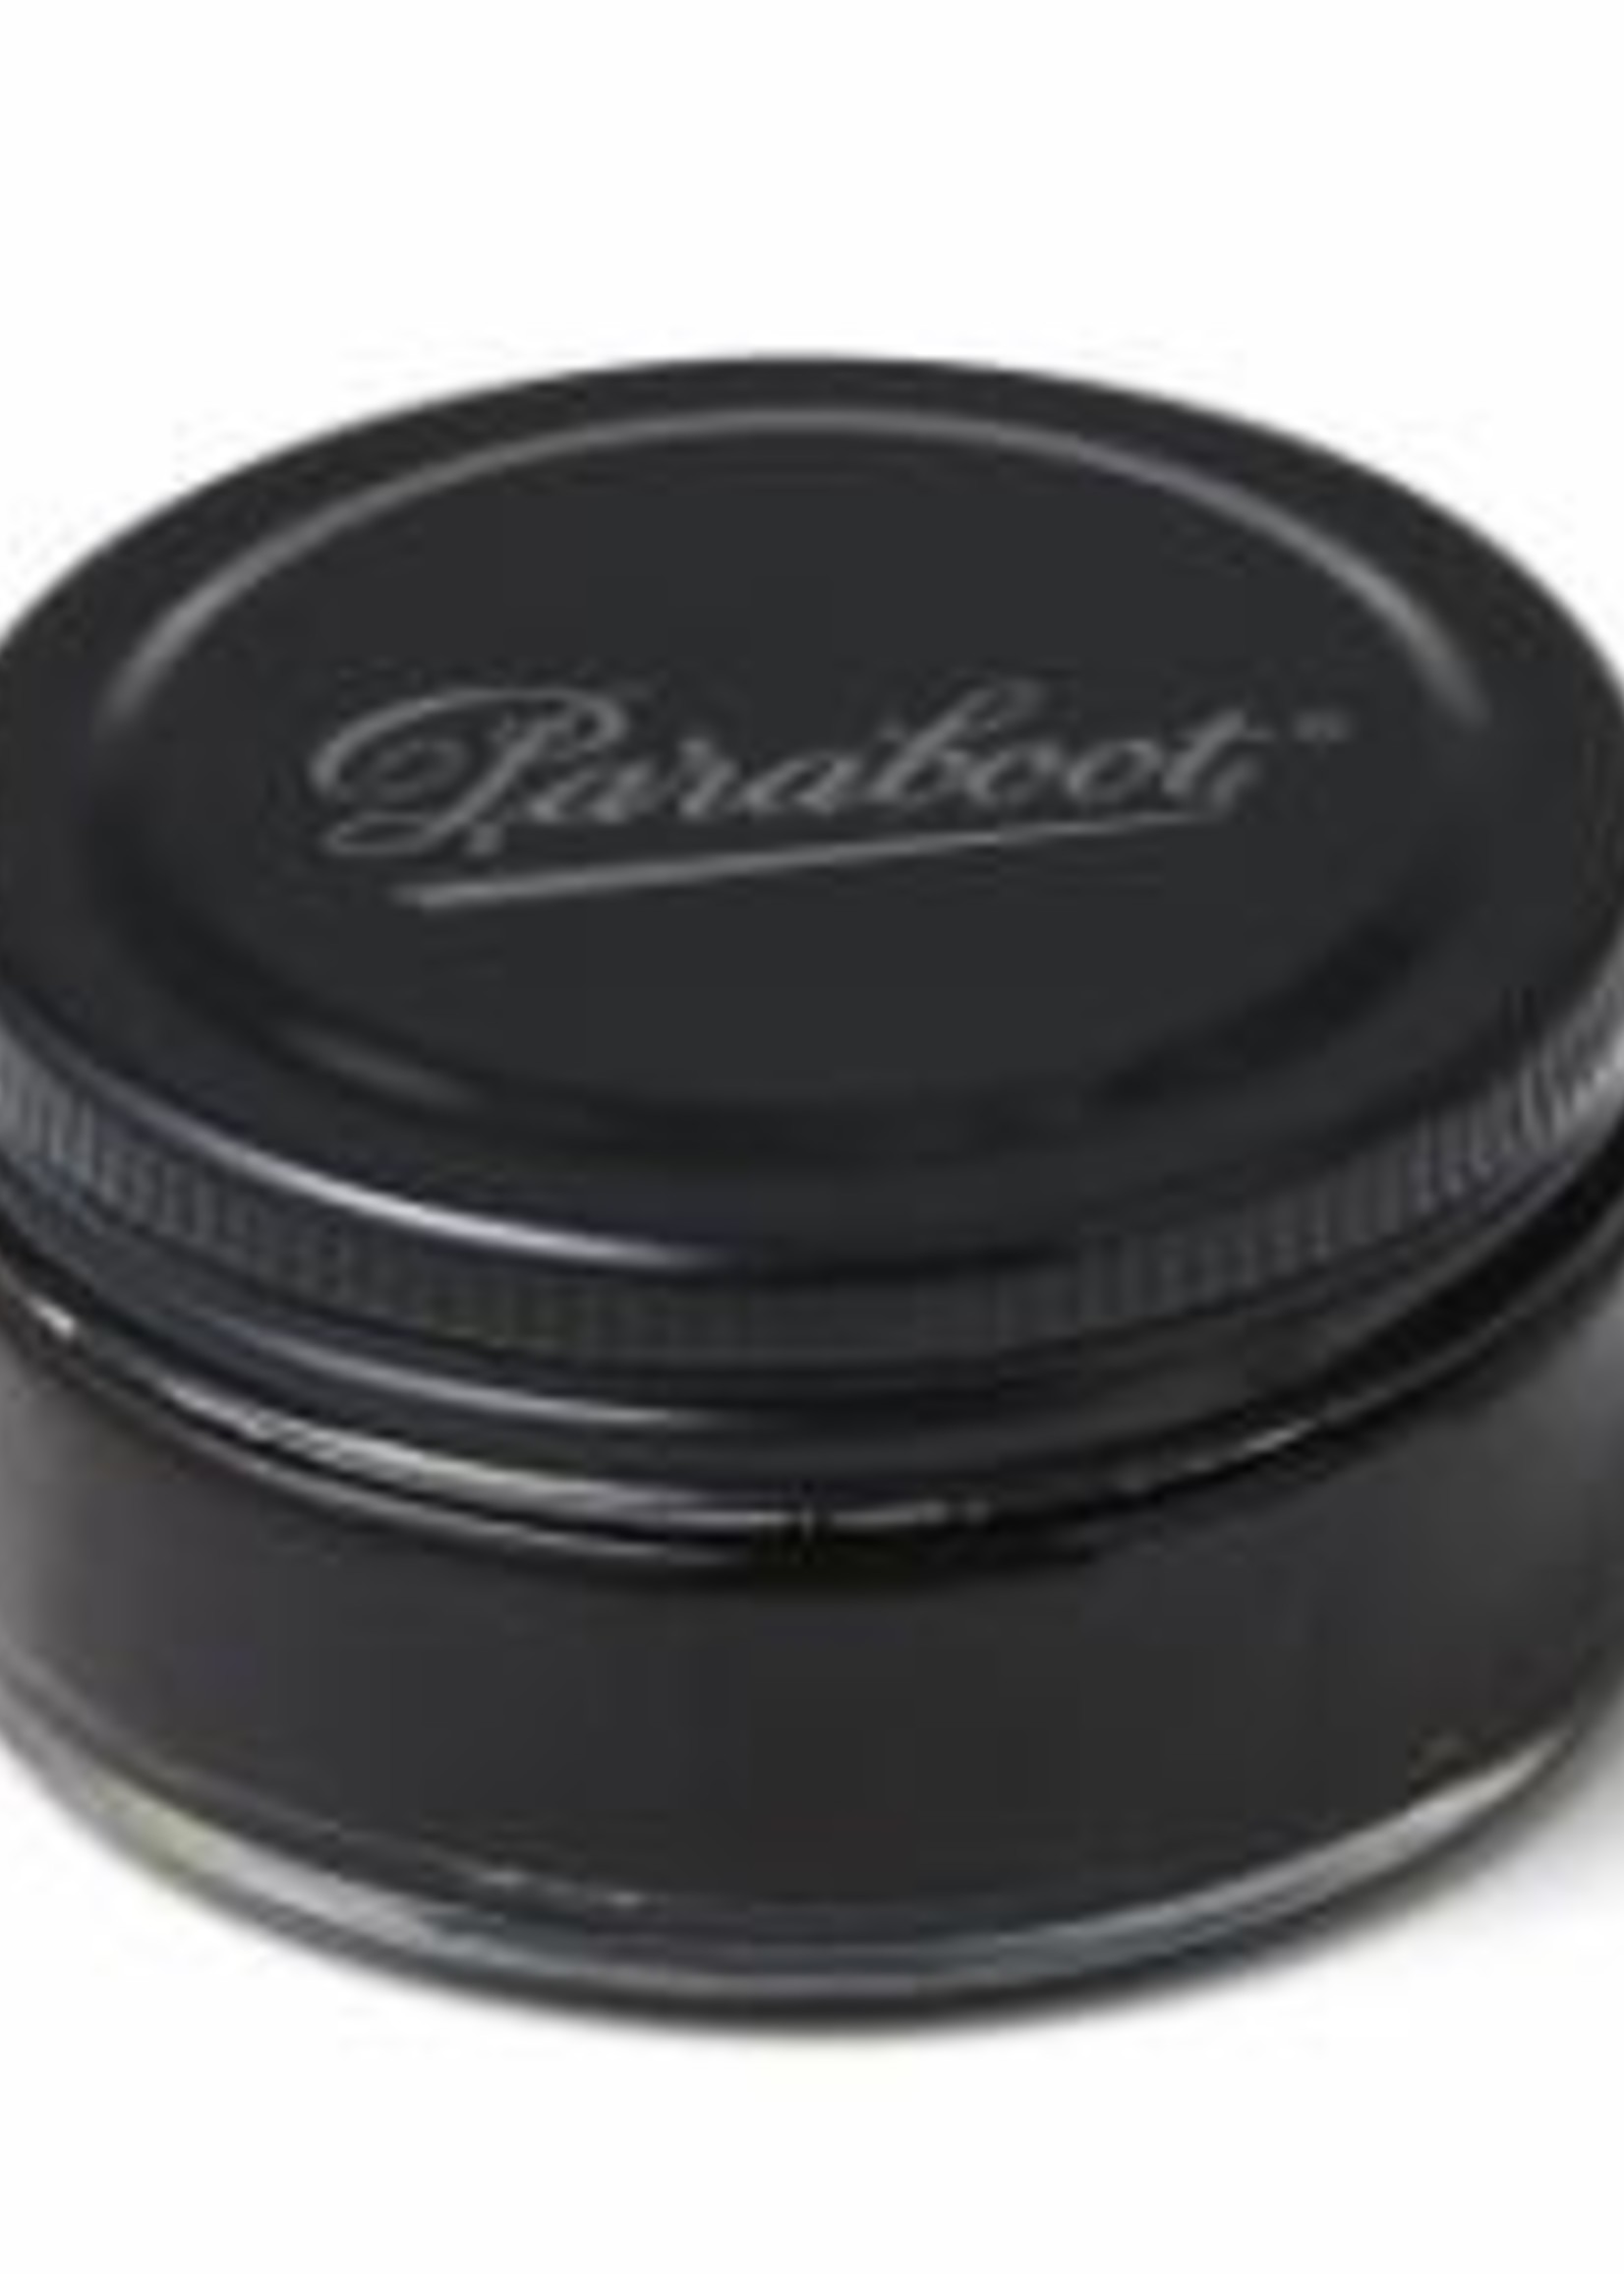 Paraboot Paraboot Shoe Cream  Noir